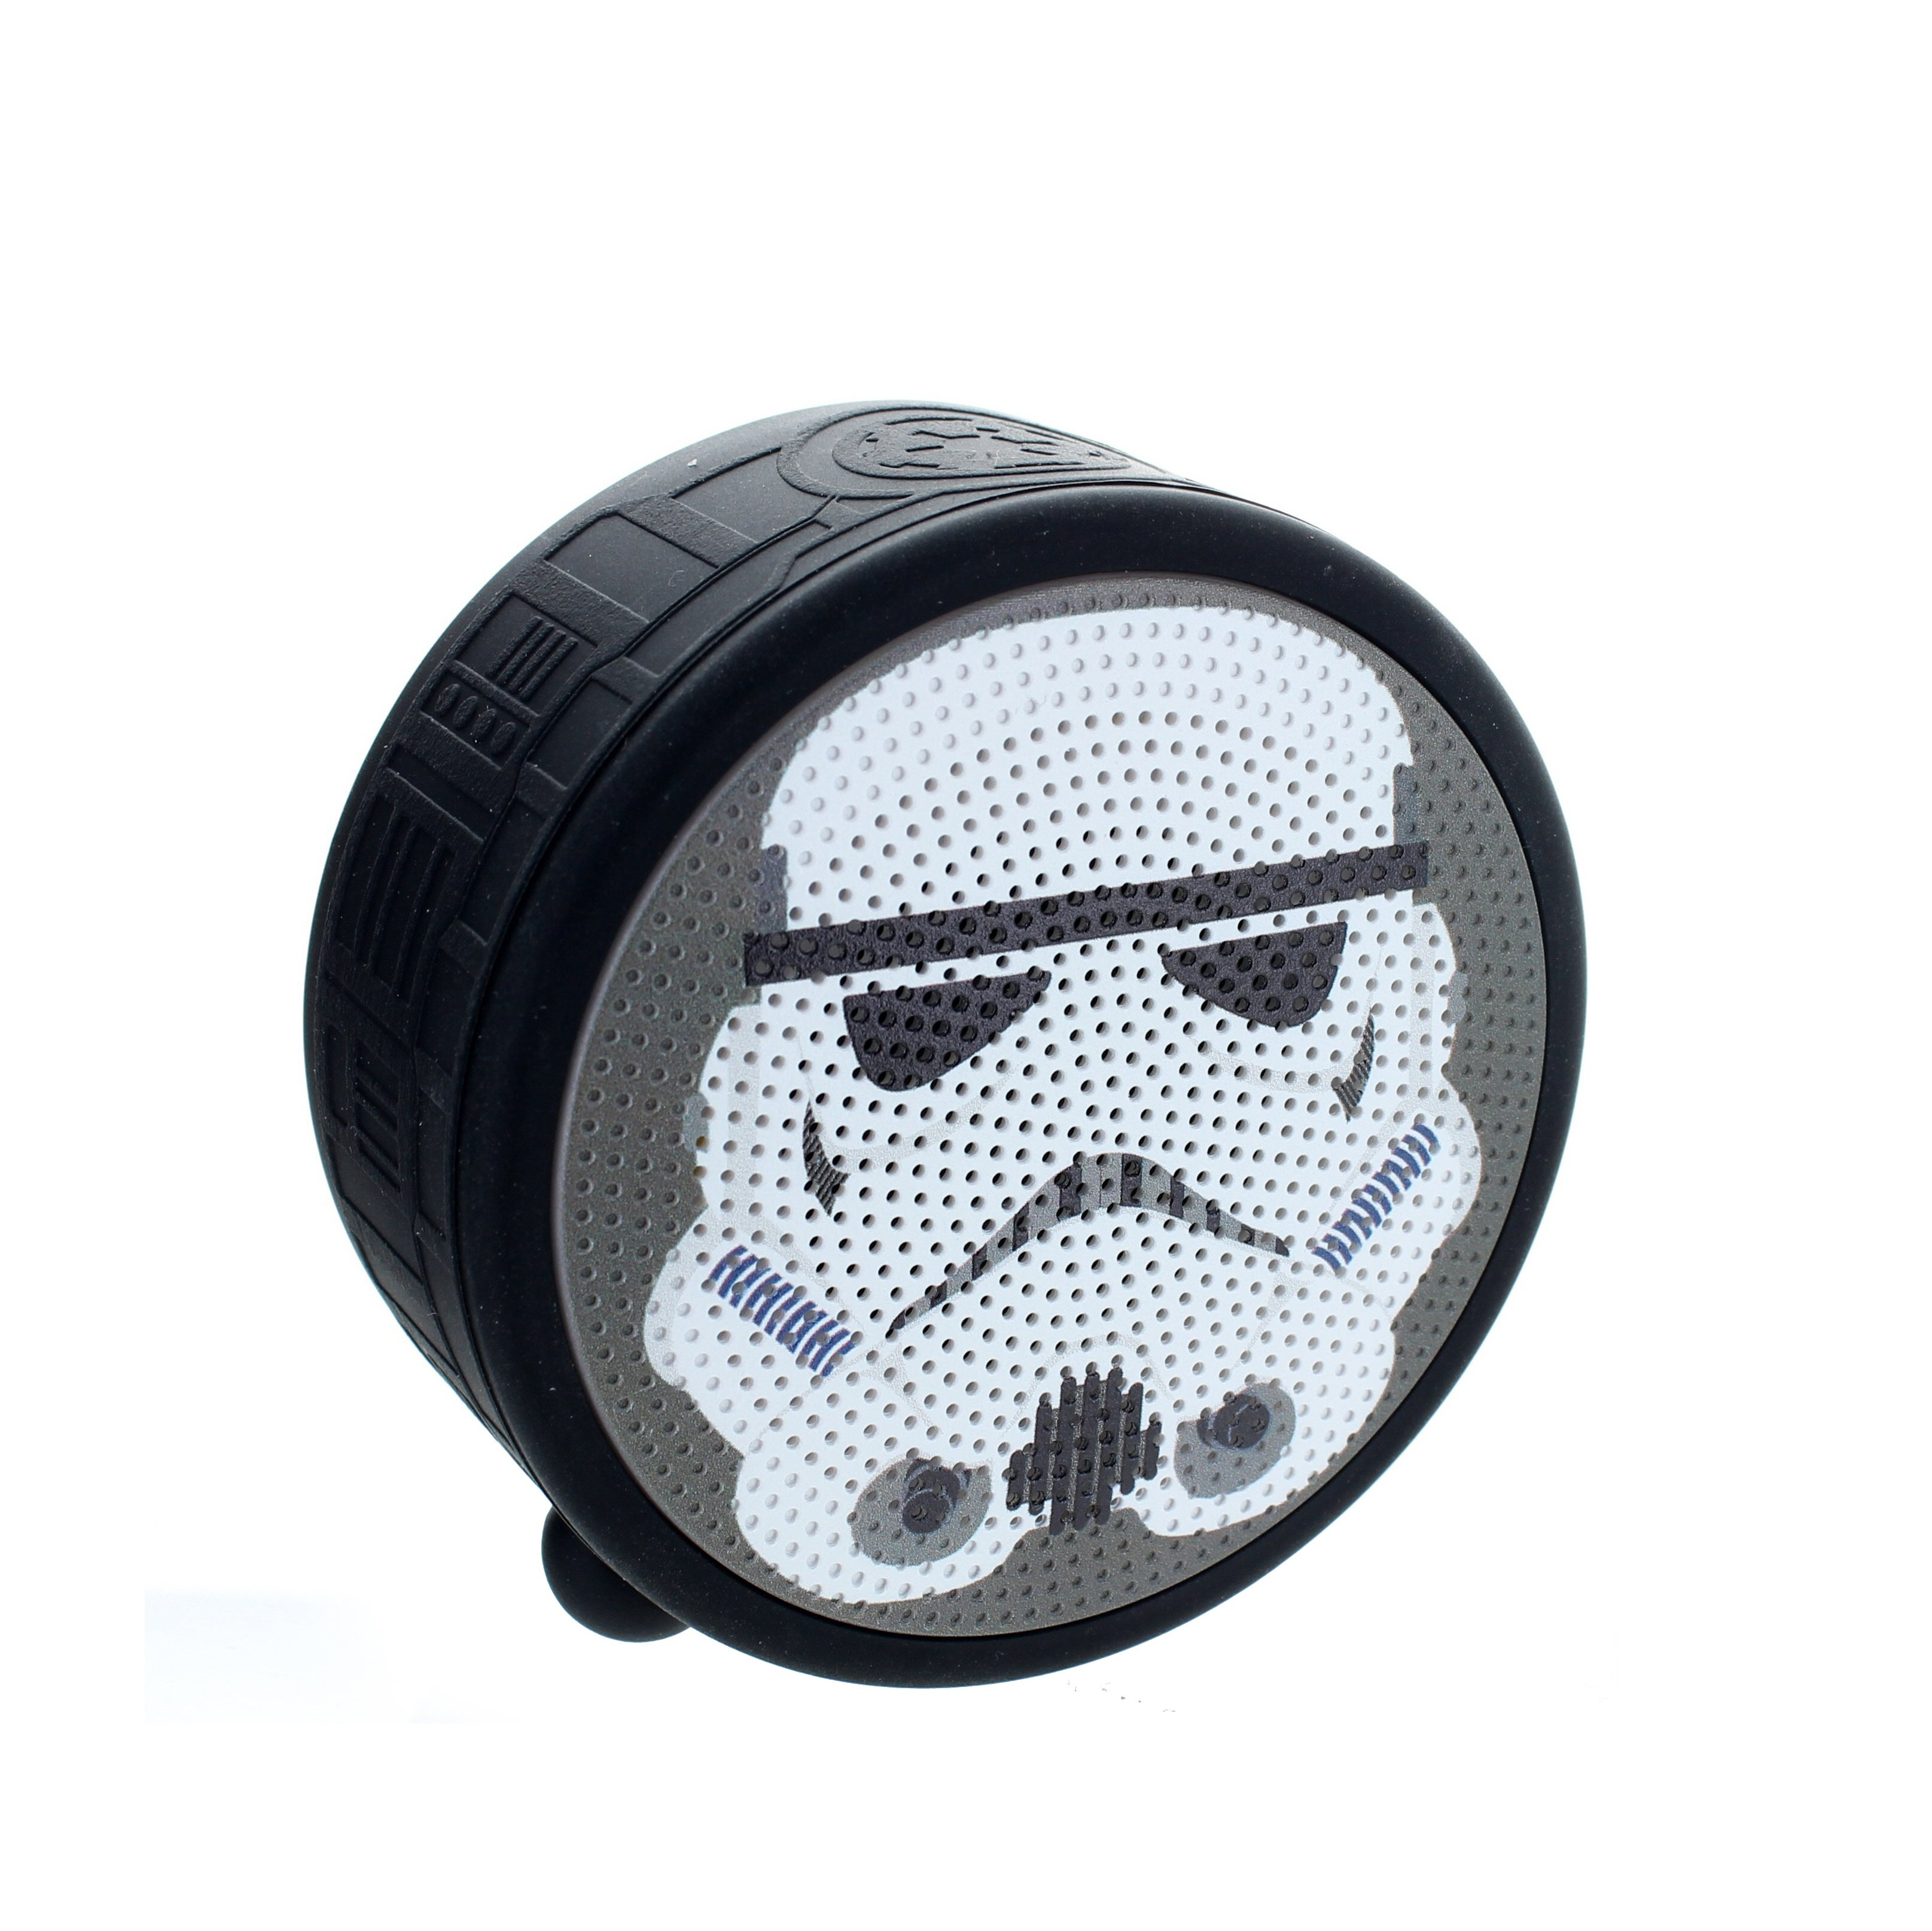 Star Wars Trooper Bluetooth Speaker Image